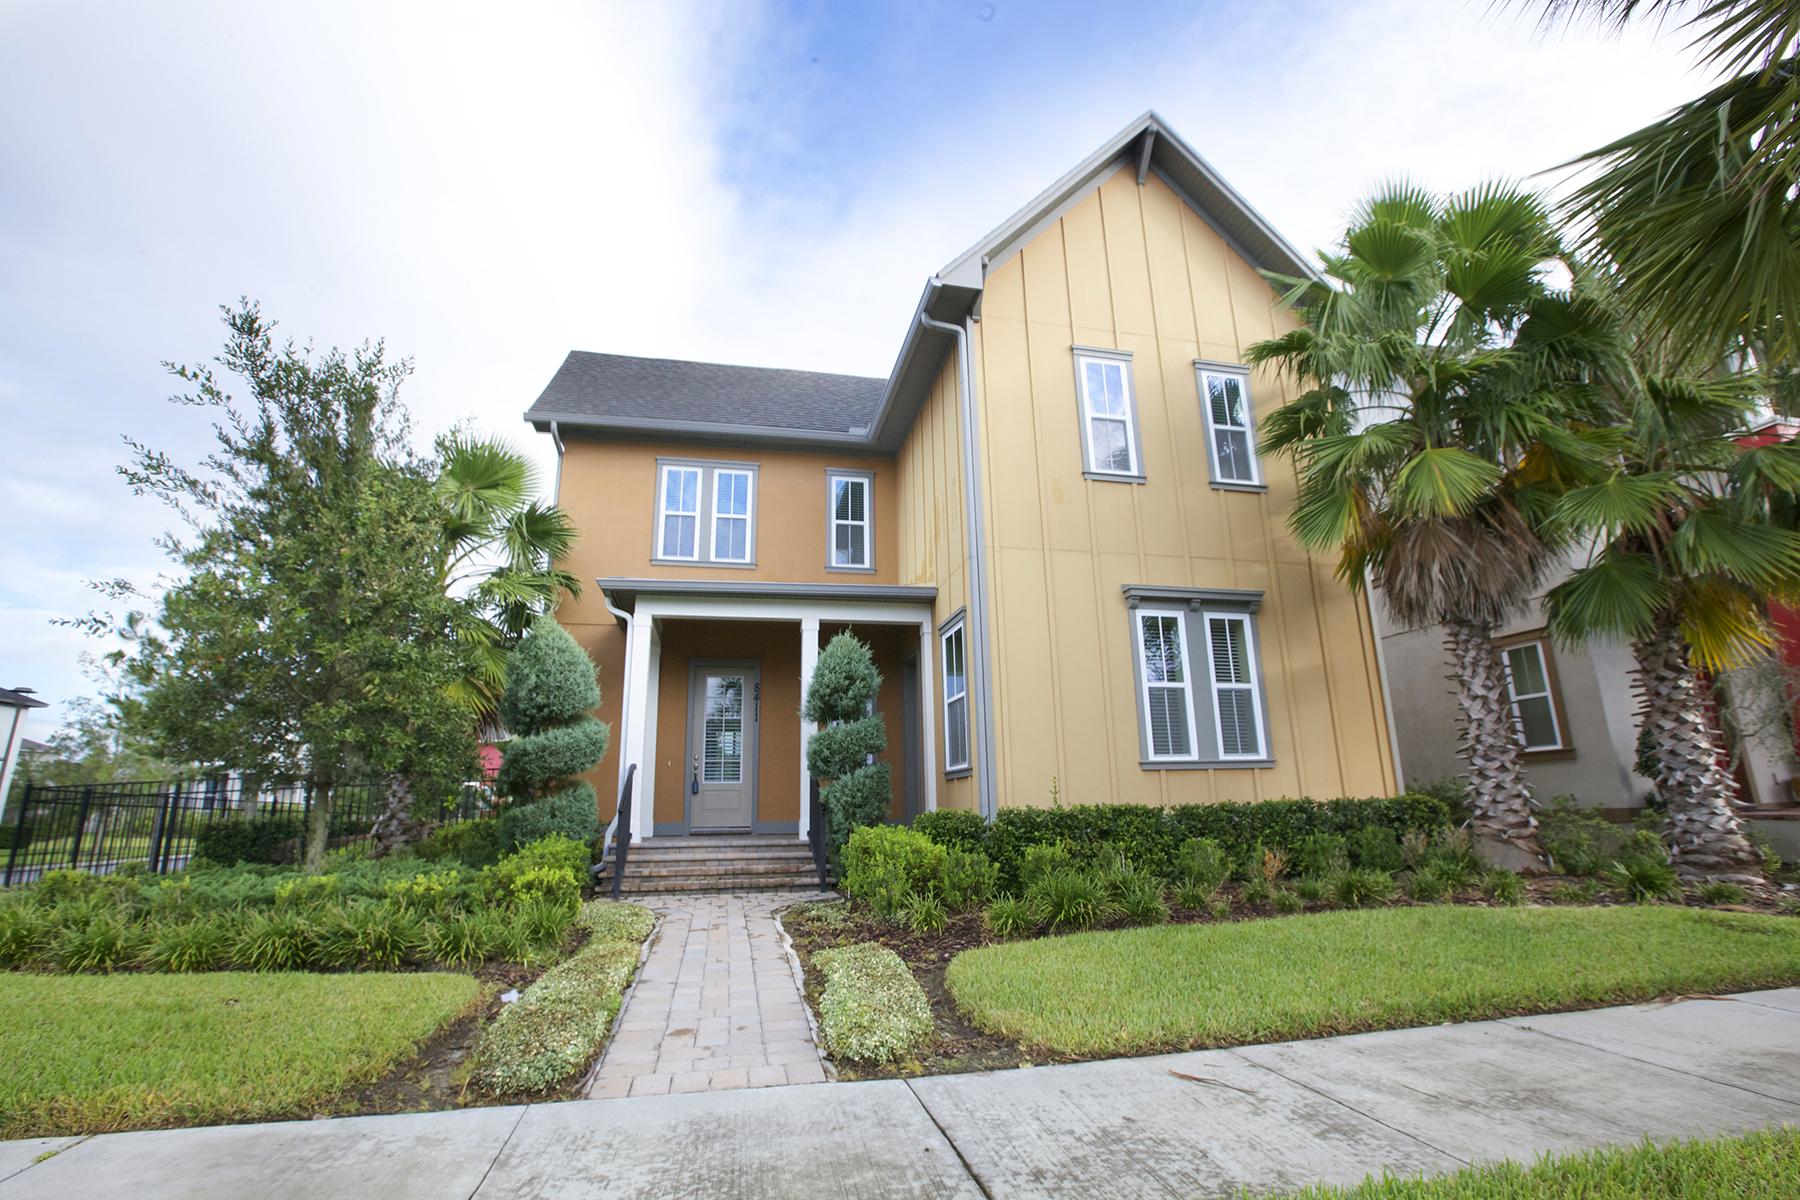 Single Family Home for Sale at ORLANDO - LAKE NONA 8411 Laureate Blvd Orlando, Florida, 32827 United States